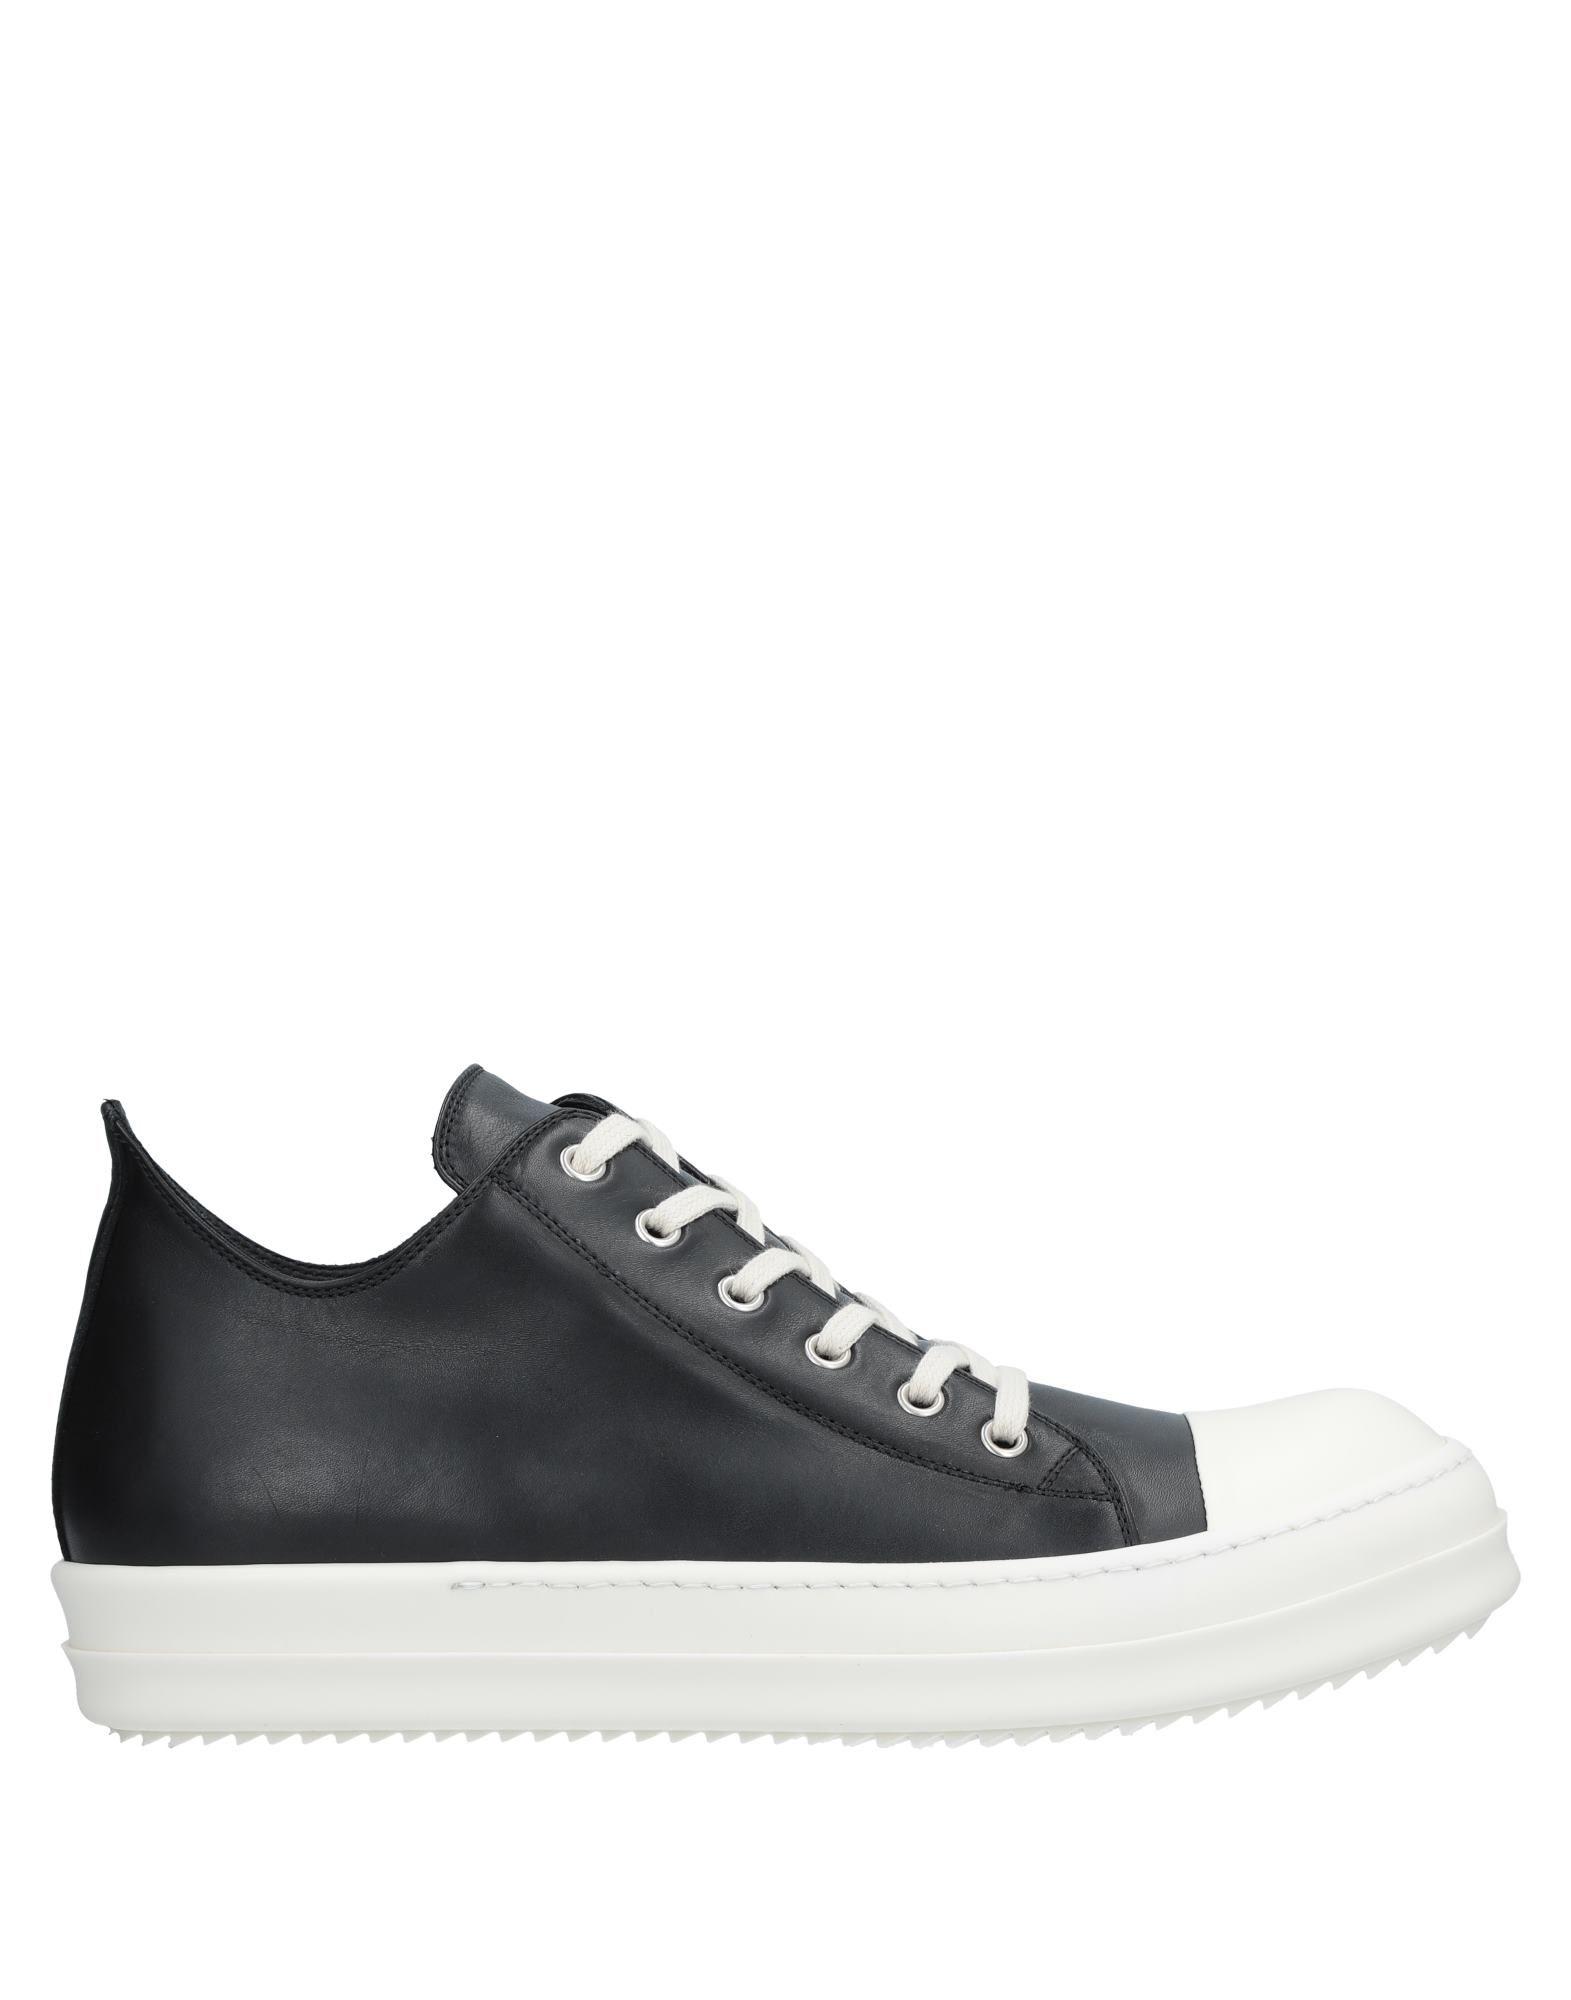 Sandali Prada Donna - 11507264KU Scarpe economiche e buone